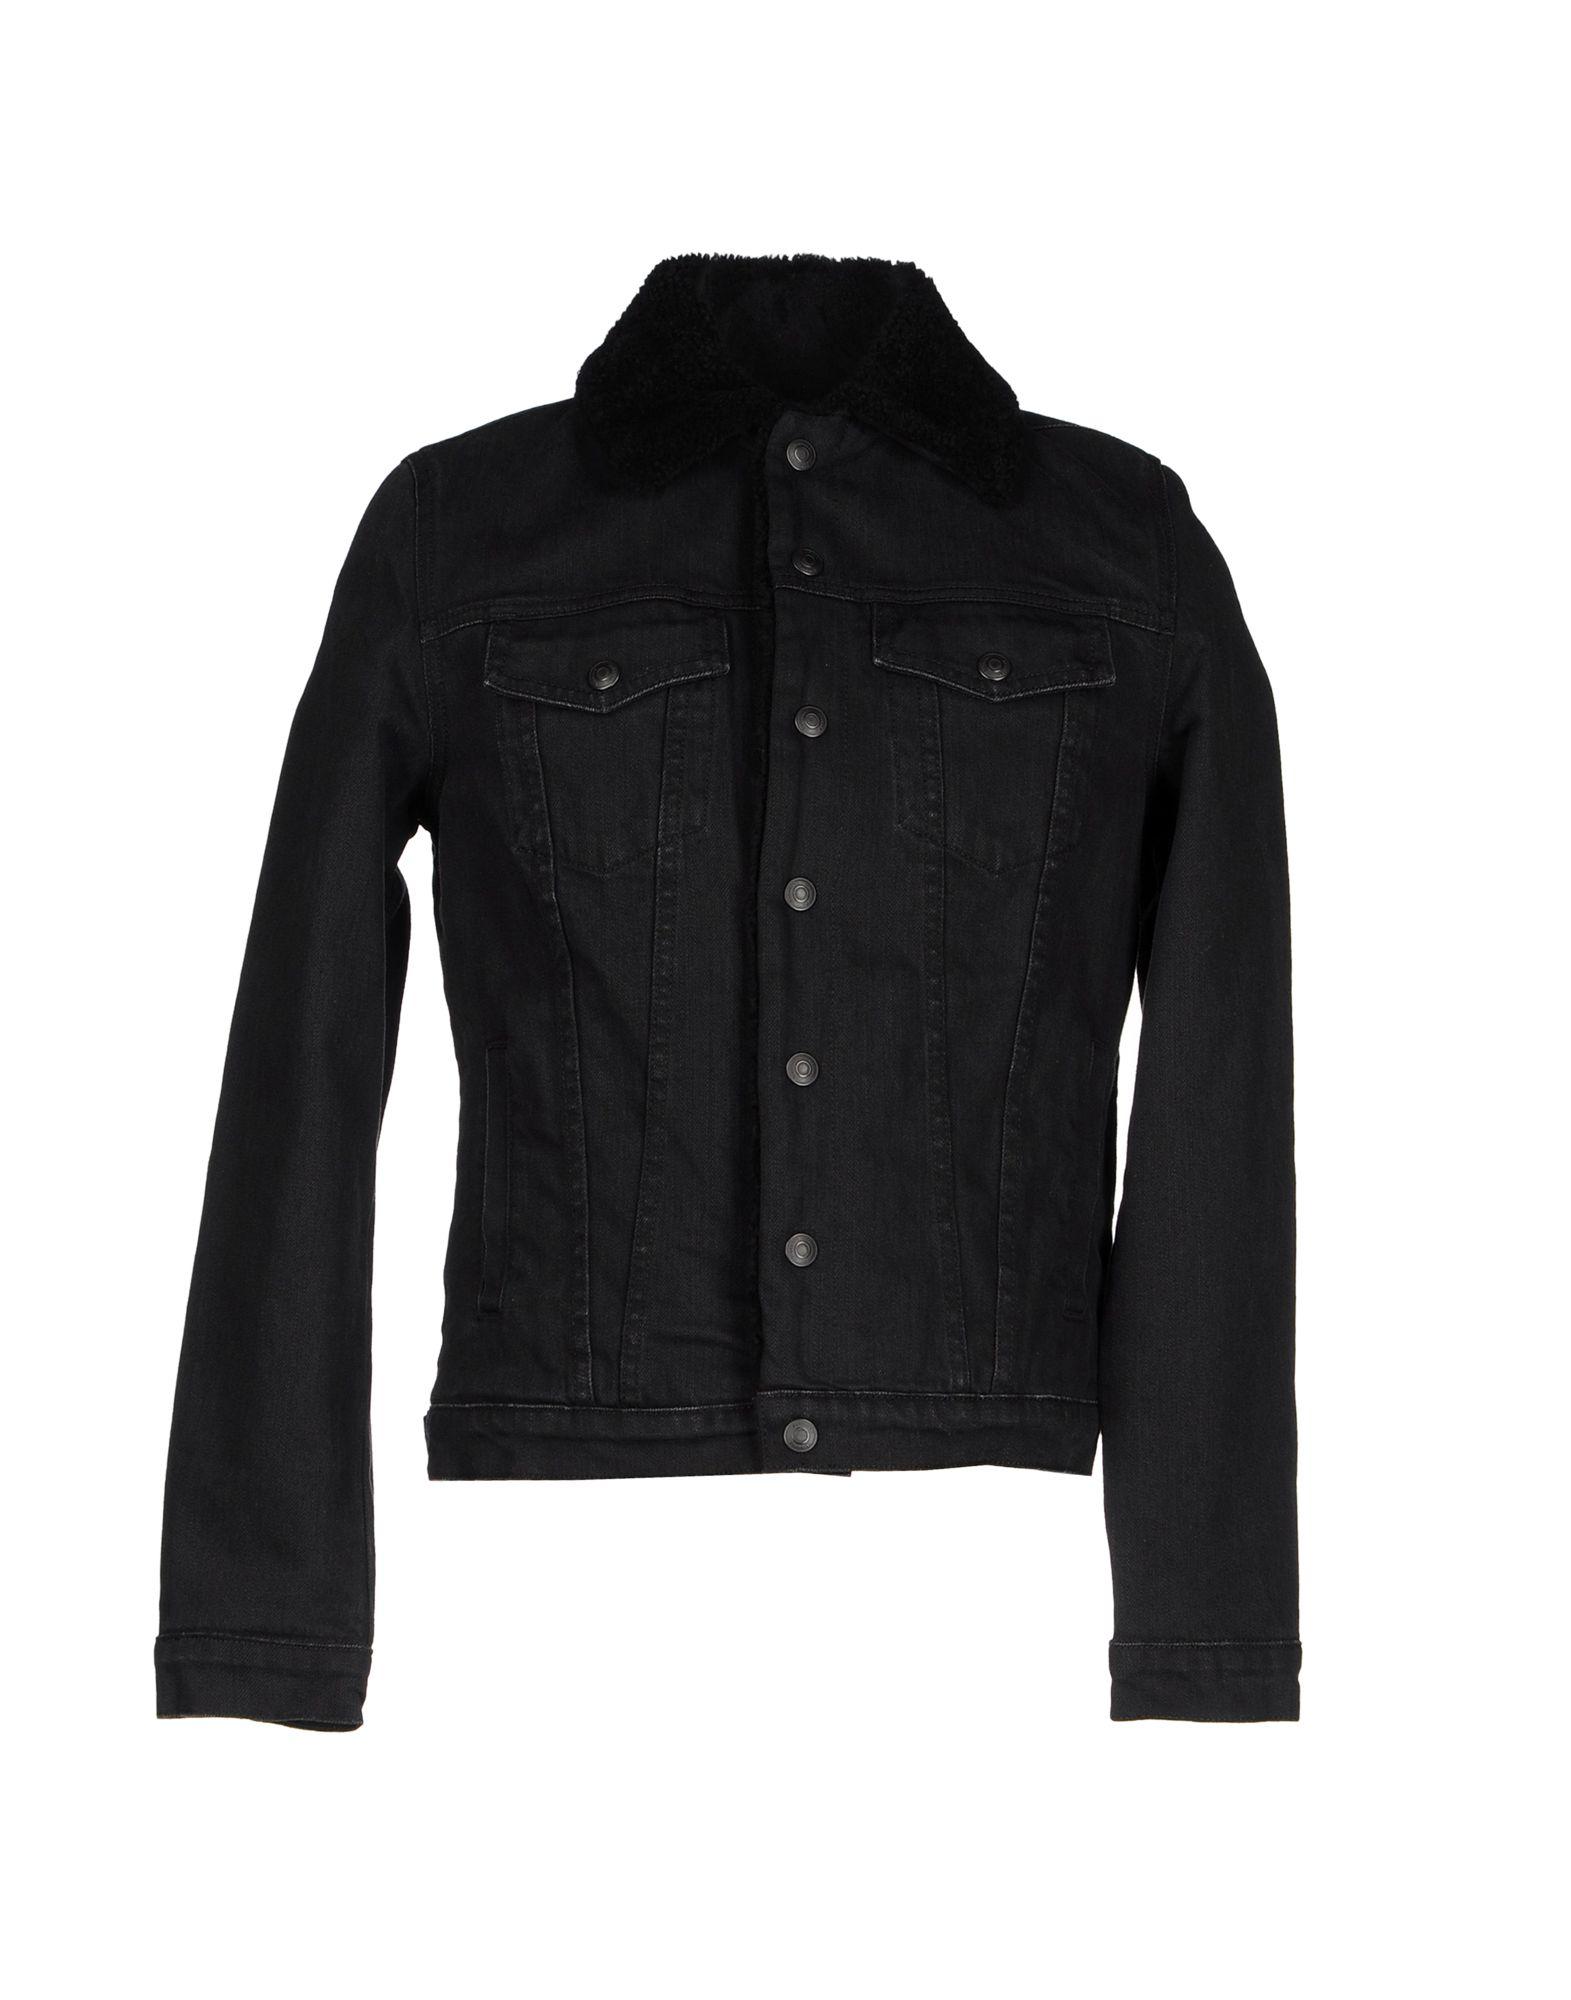 PROENZA SCHOULER Джинсовая верхняя одежда proenza schouler джинсовая верхняя одежда